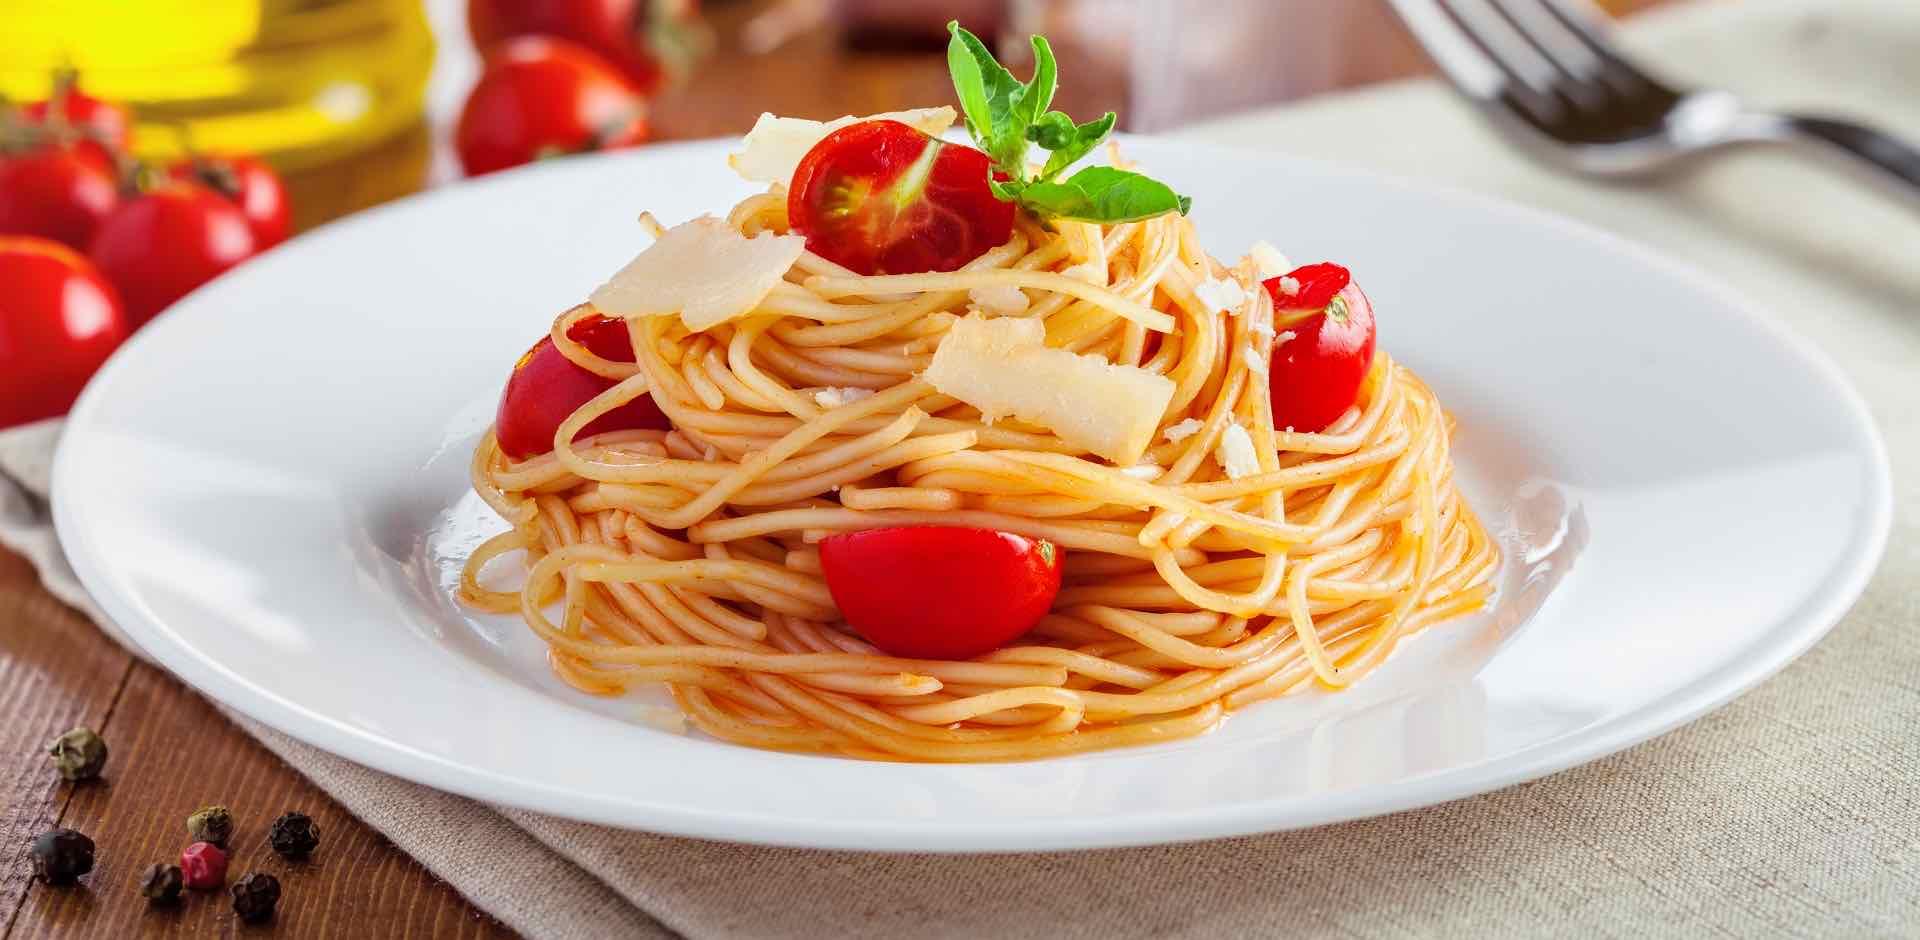 pasta pomodoro basilico - pasta tomatoes basil - Gustorotondo Italian food boutique - I migliori cibi online - Best Italian food online